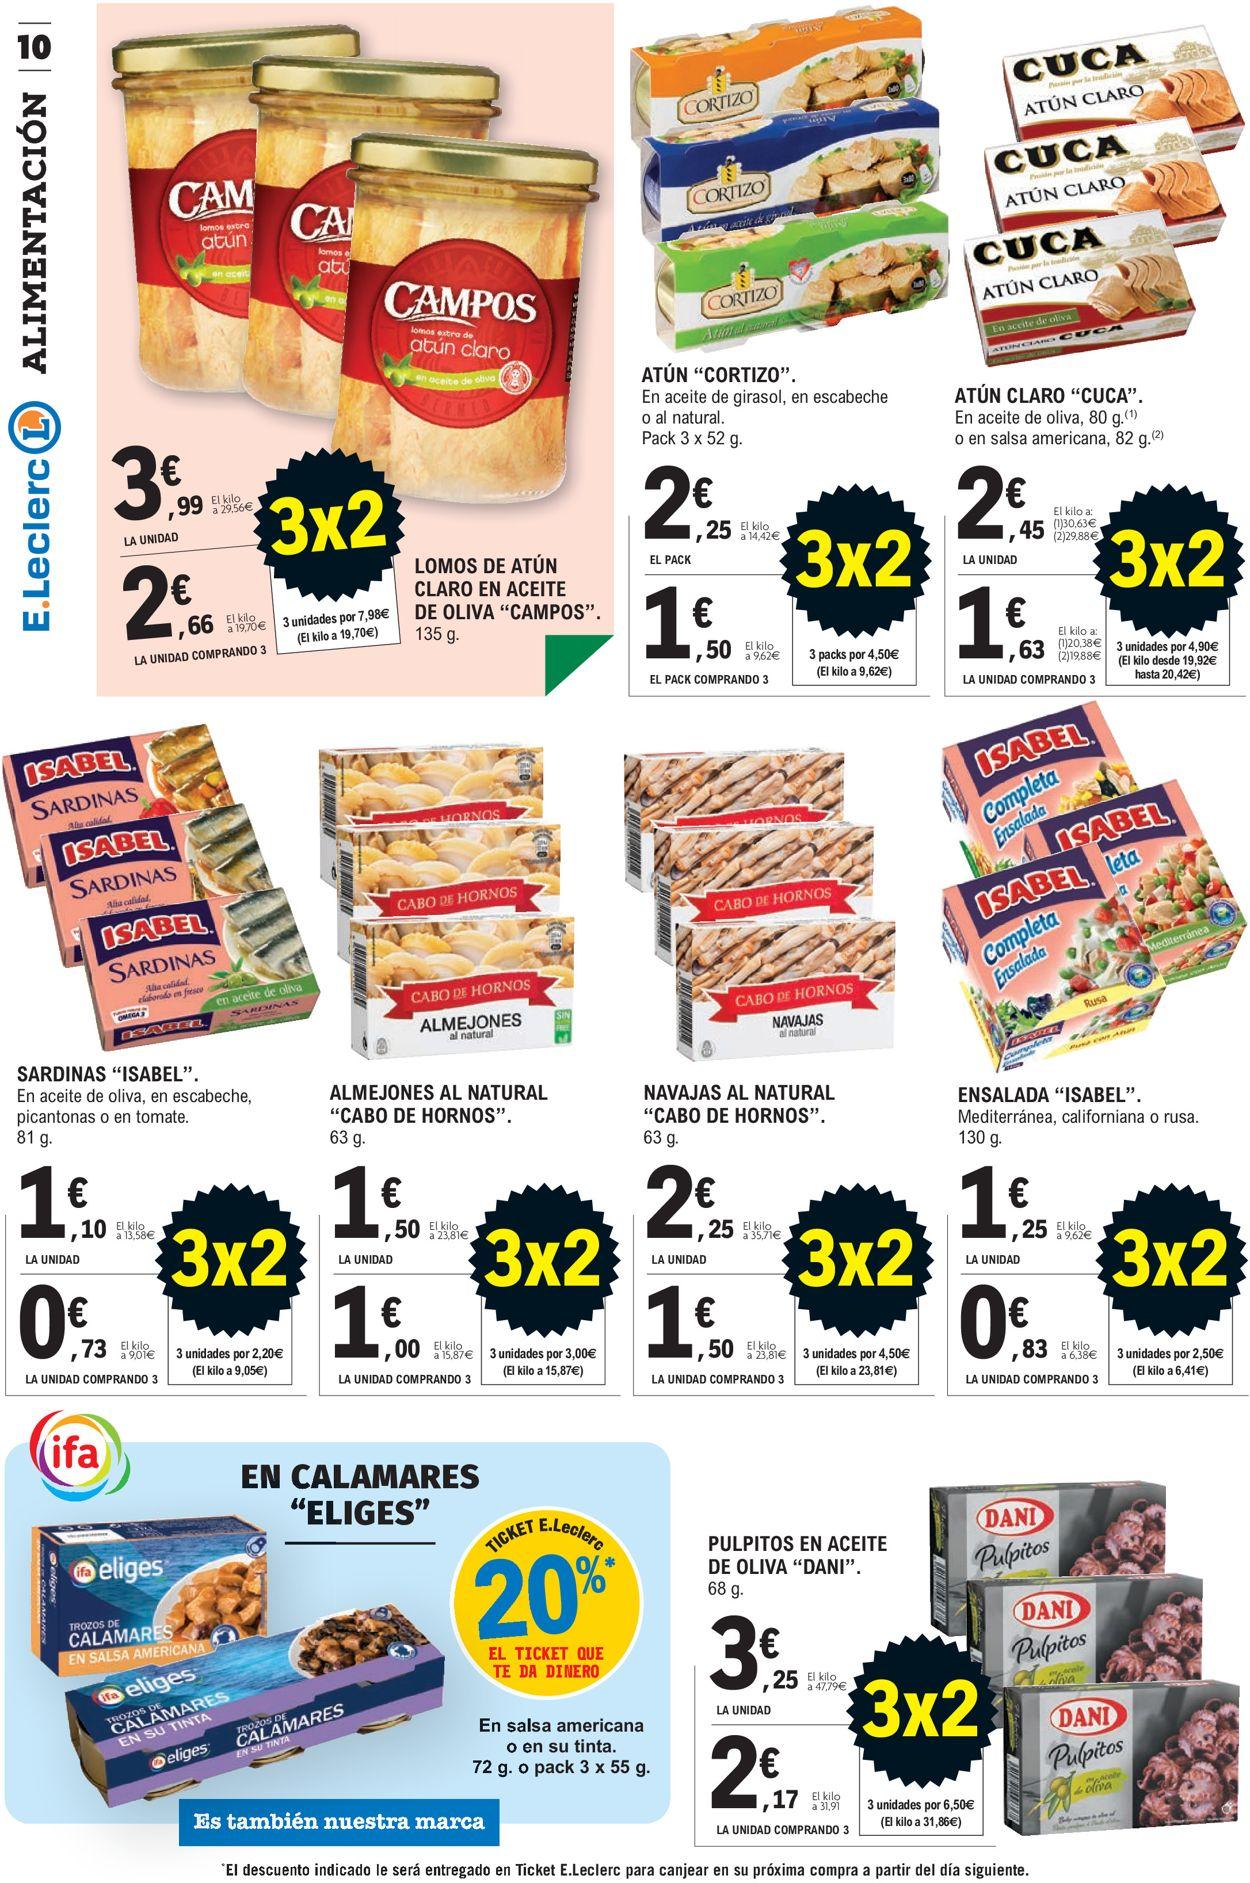 E.leclerc Folleto - 03.02-14.02.2021 (Página 10)